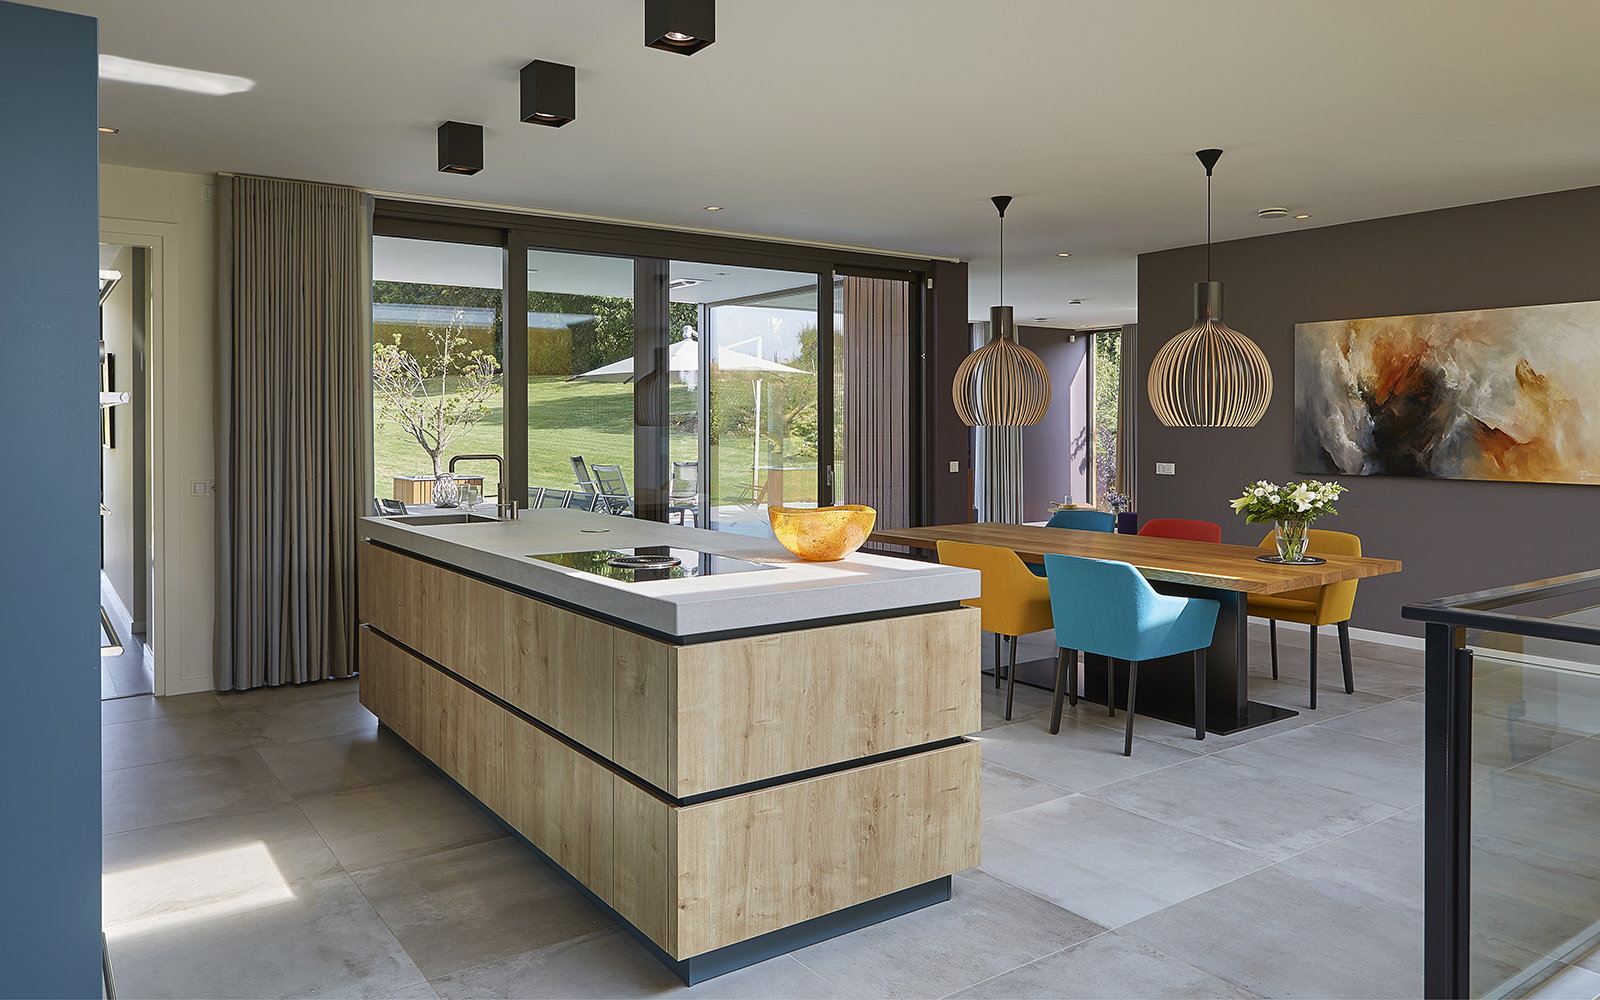 Moderne stijl, 3D visie, Modern, Minimalistische woning, Houtelementen, Keuken, Strak, Kleurrijkinterieur